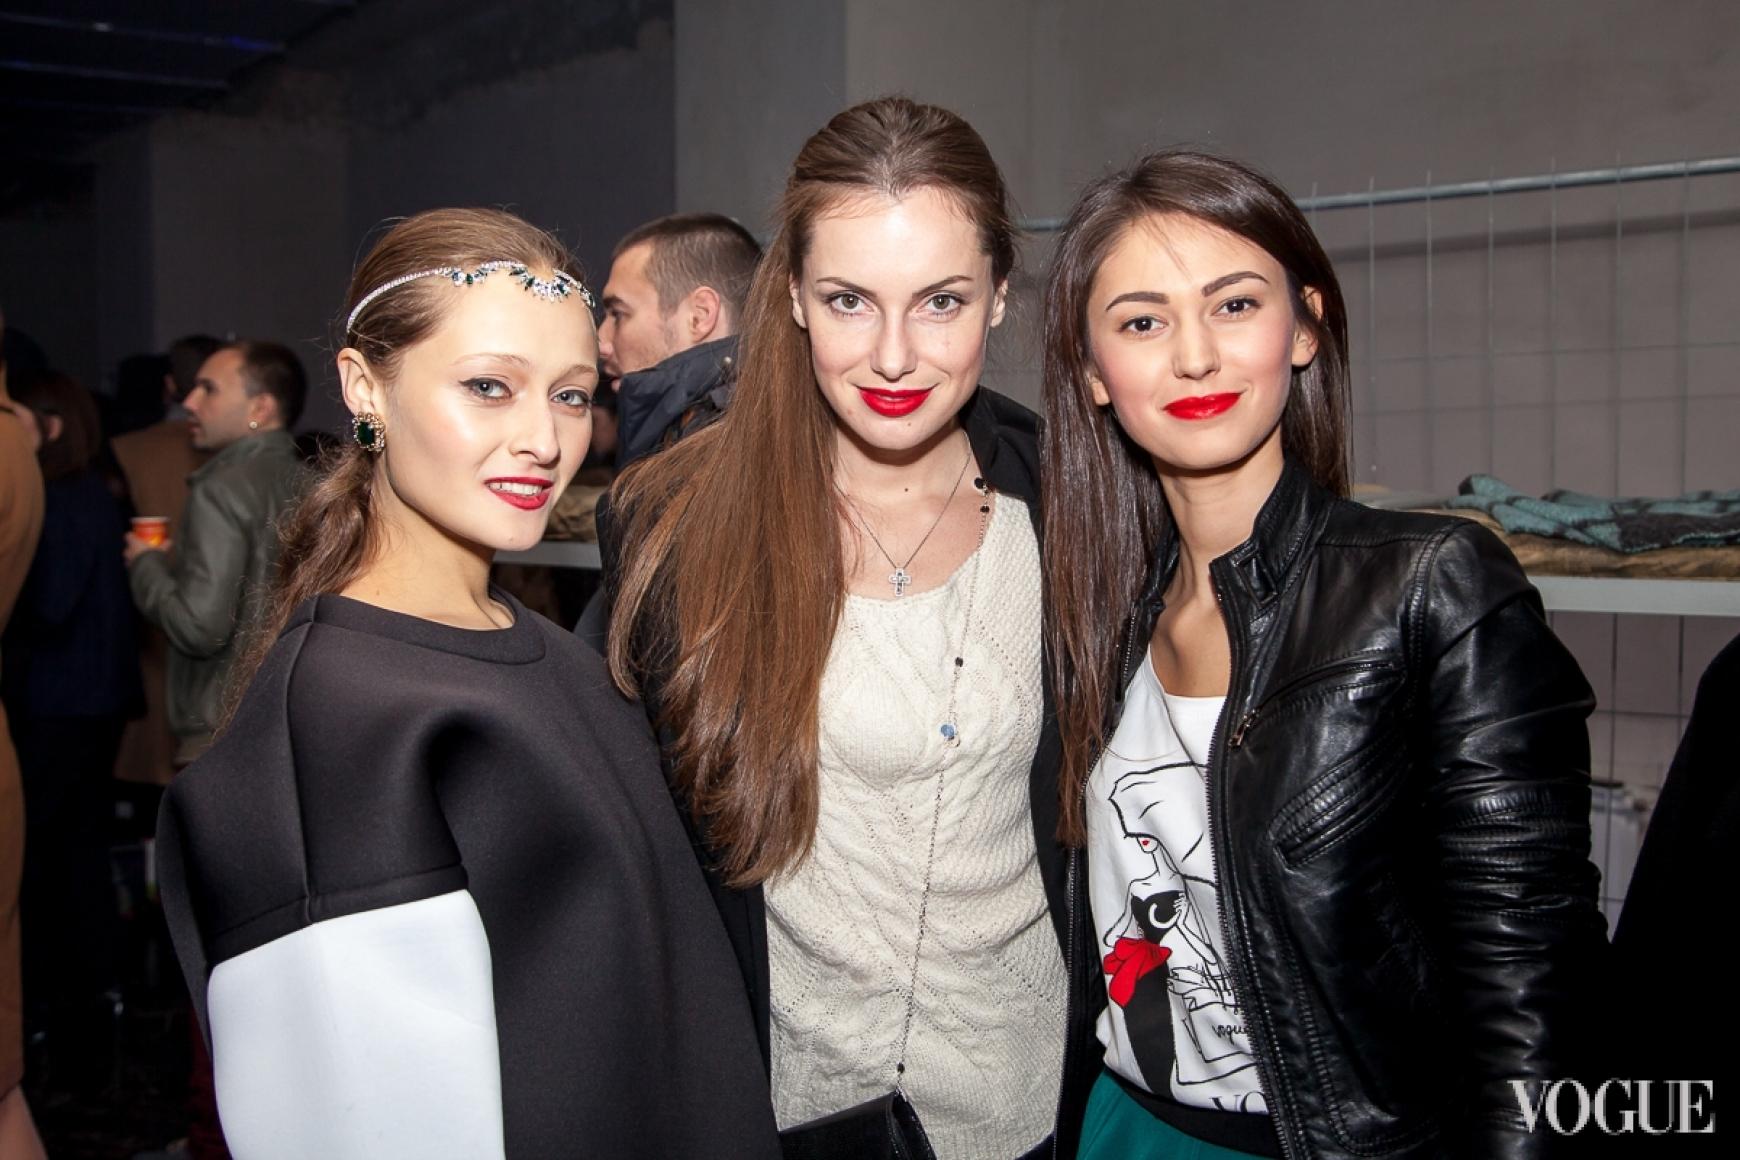 Даша Шаповалова, Елена Мигдисова и Екатерина Горина